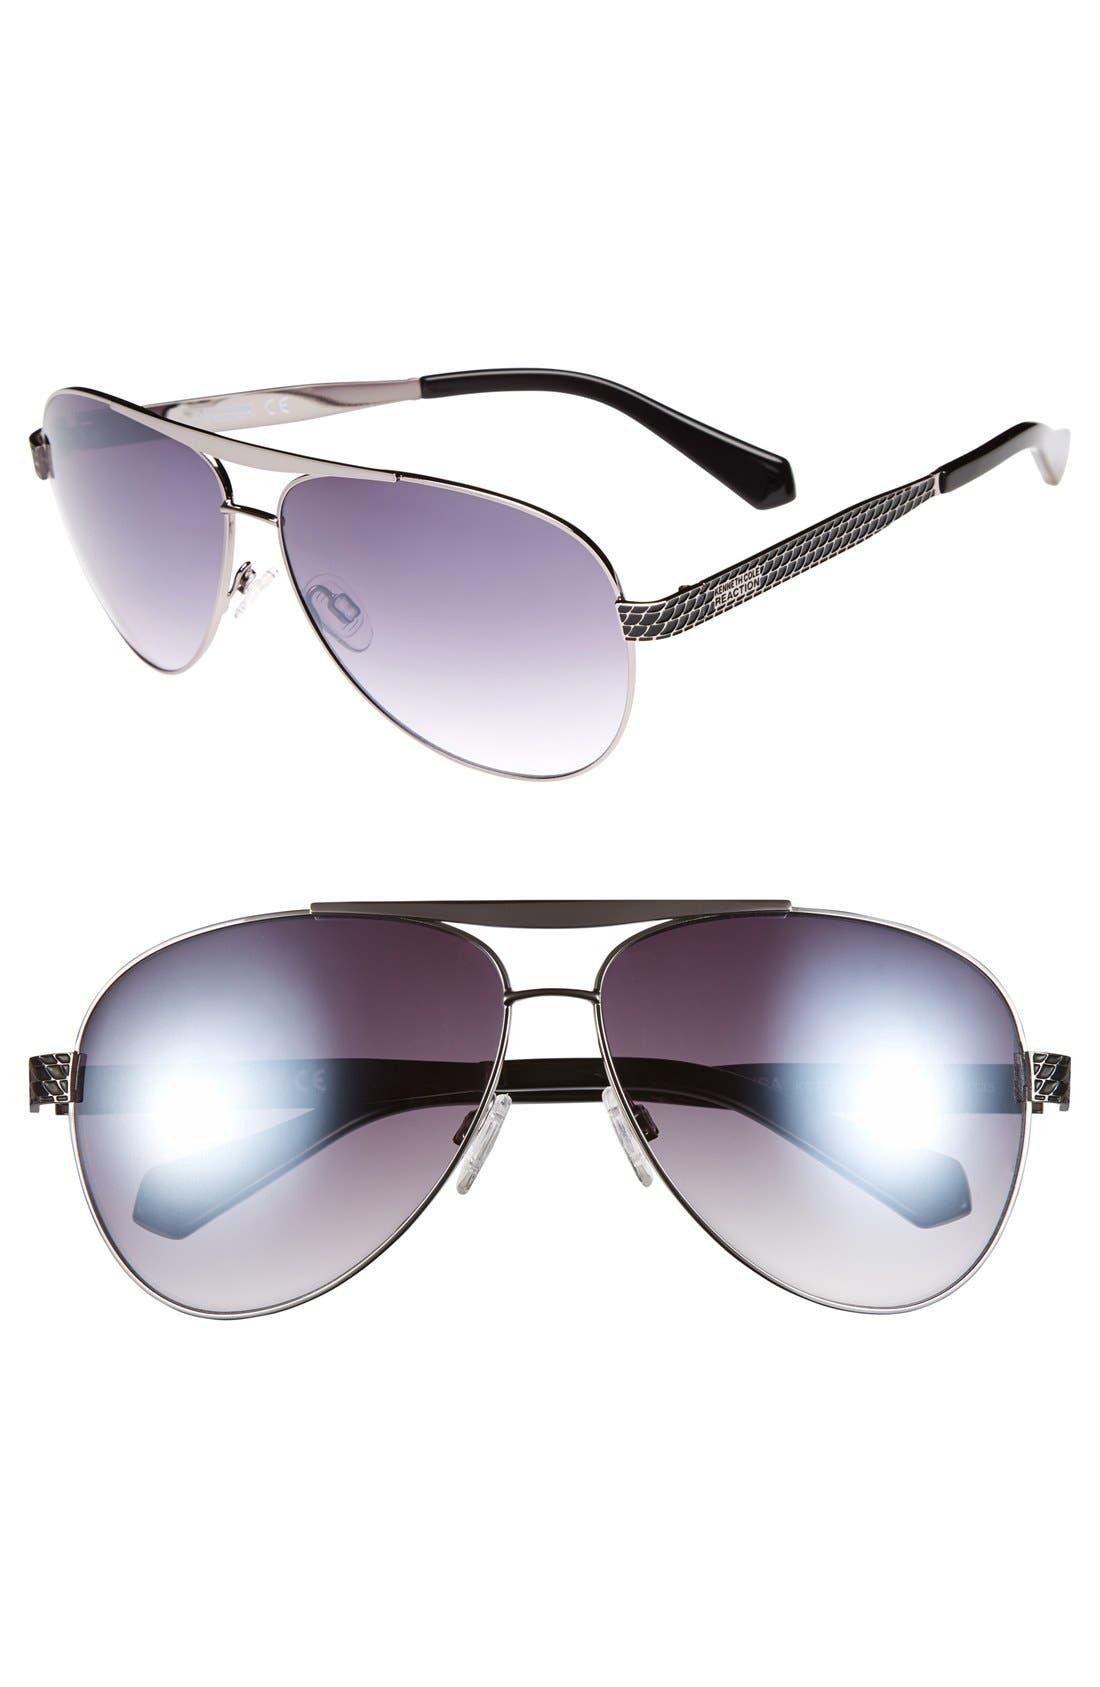 Main Image - Kenneth Cole Reaction 62mm Aviator Sunglasses